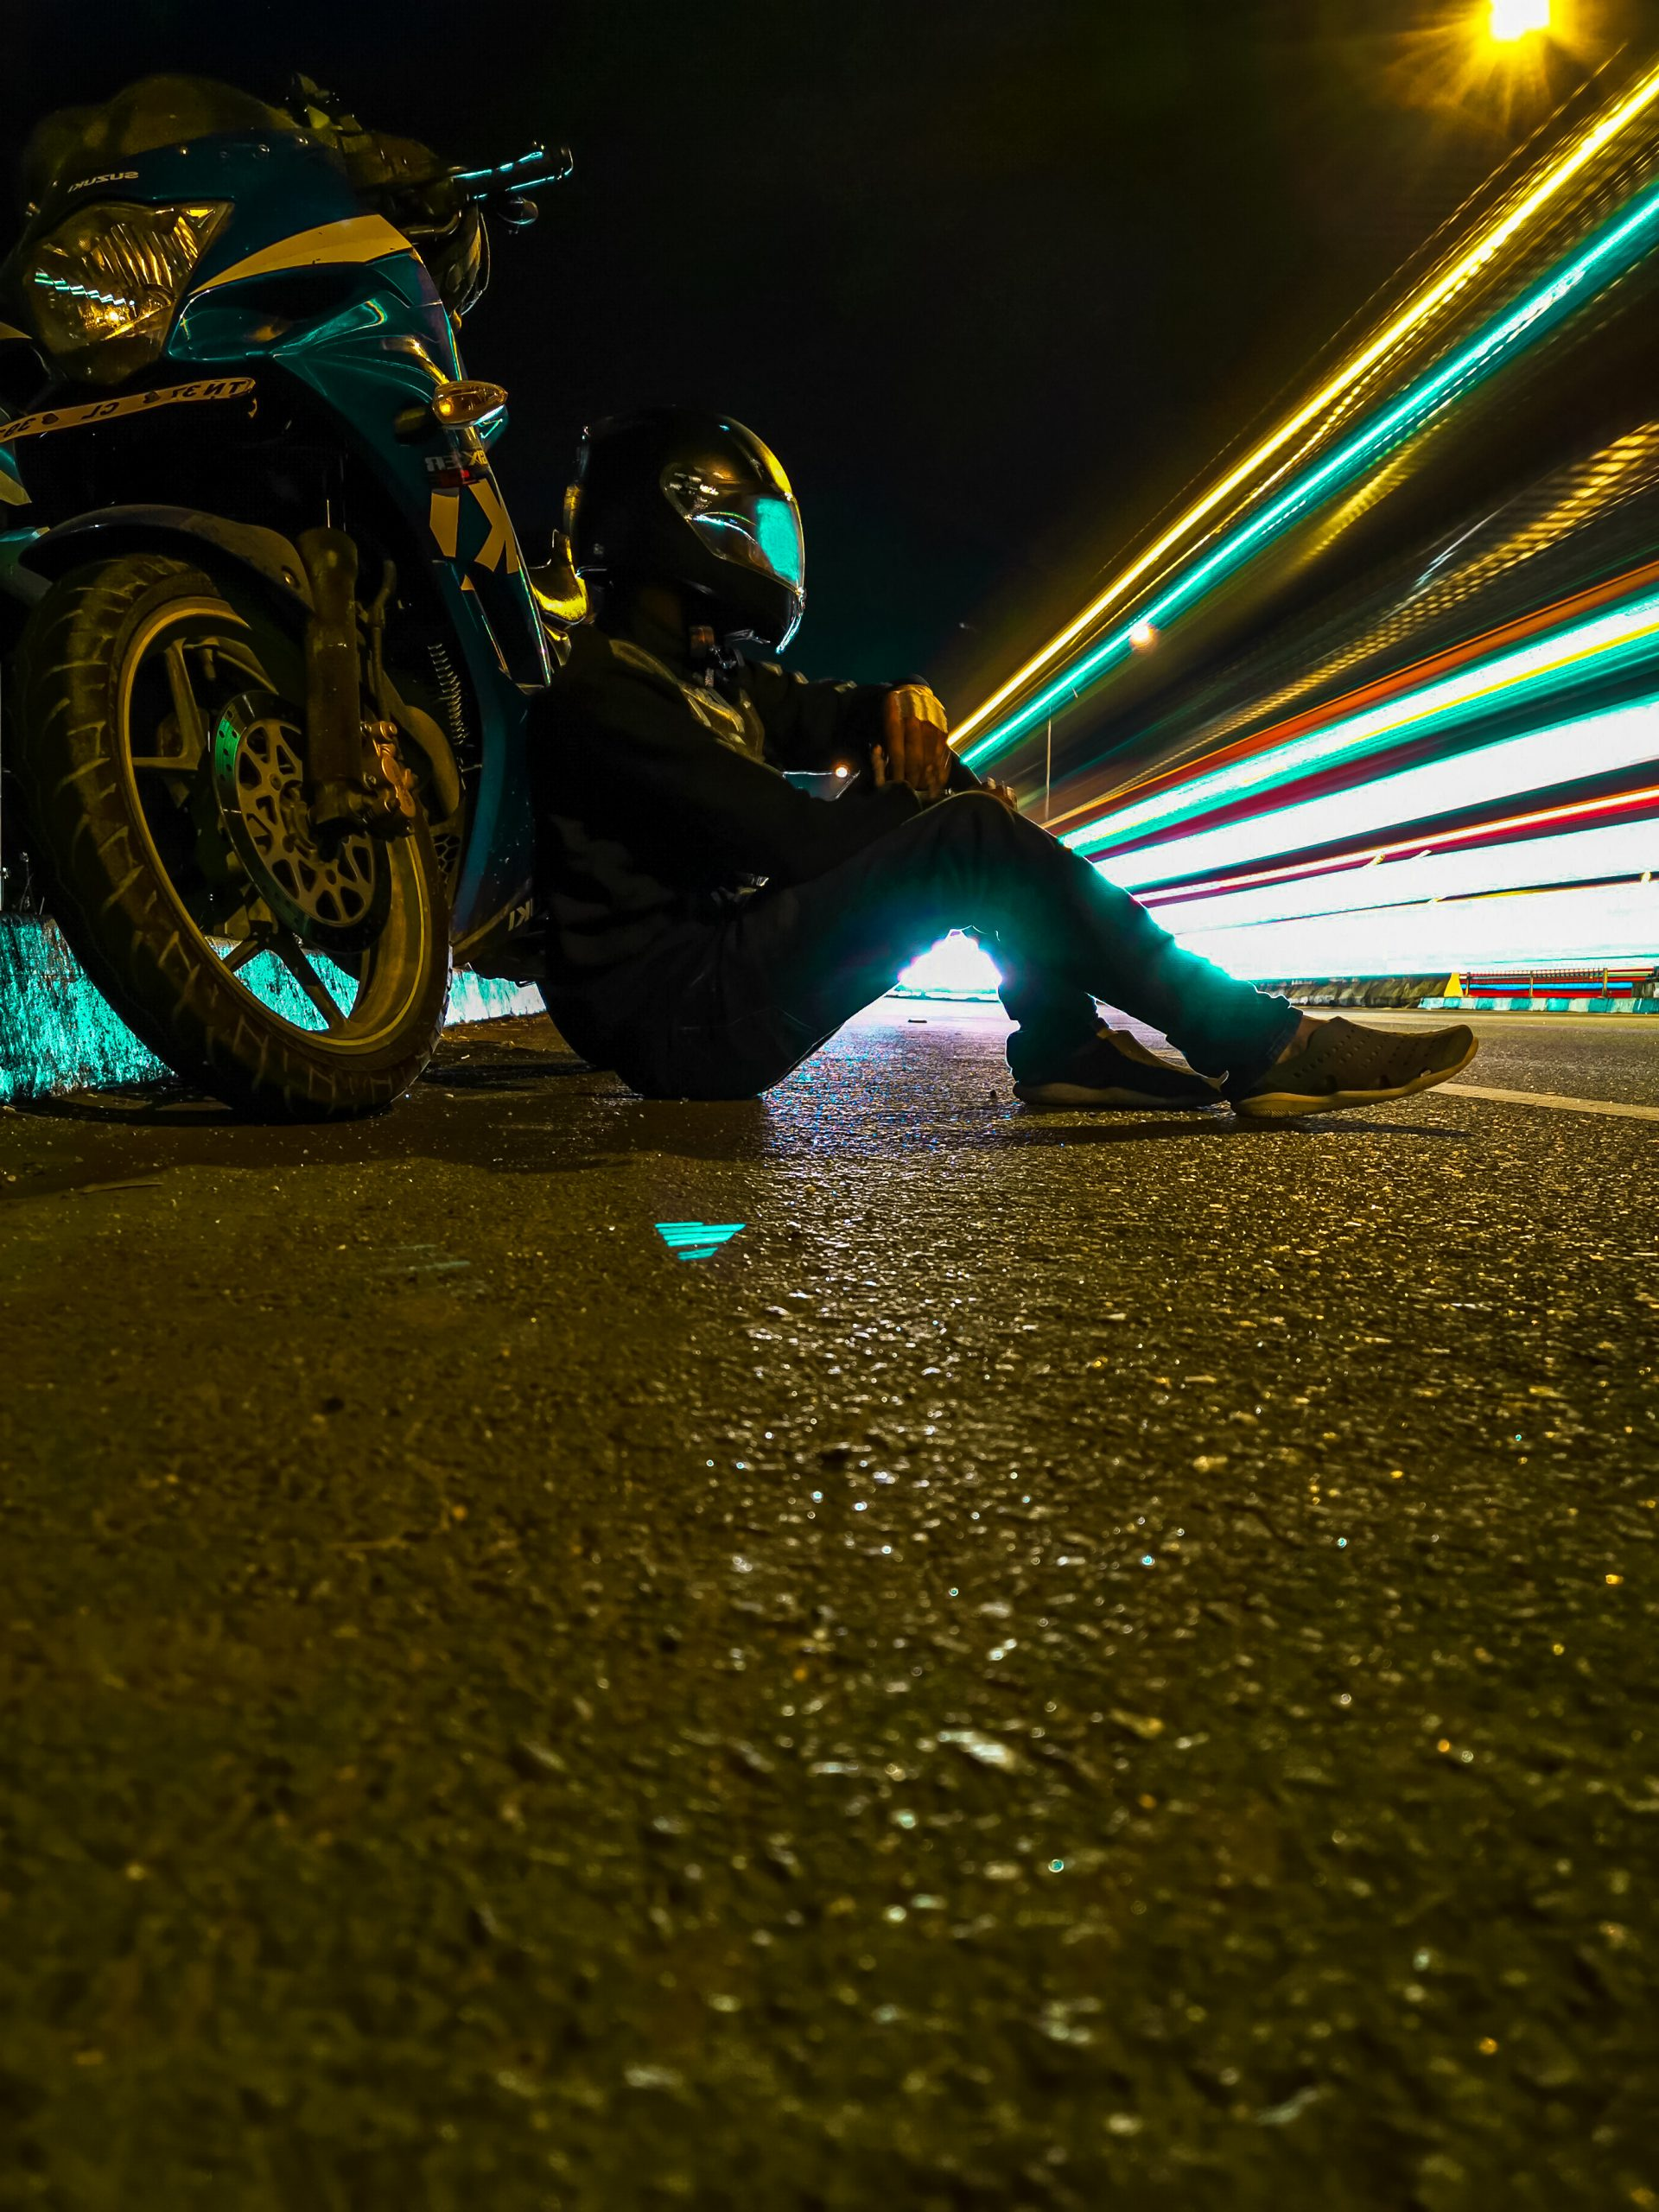 Light trails and biker